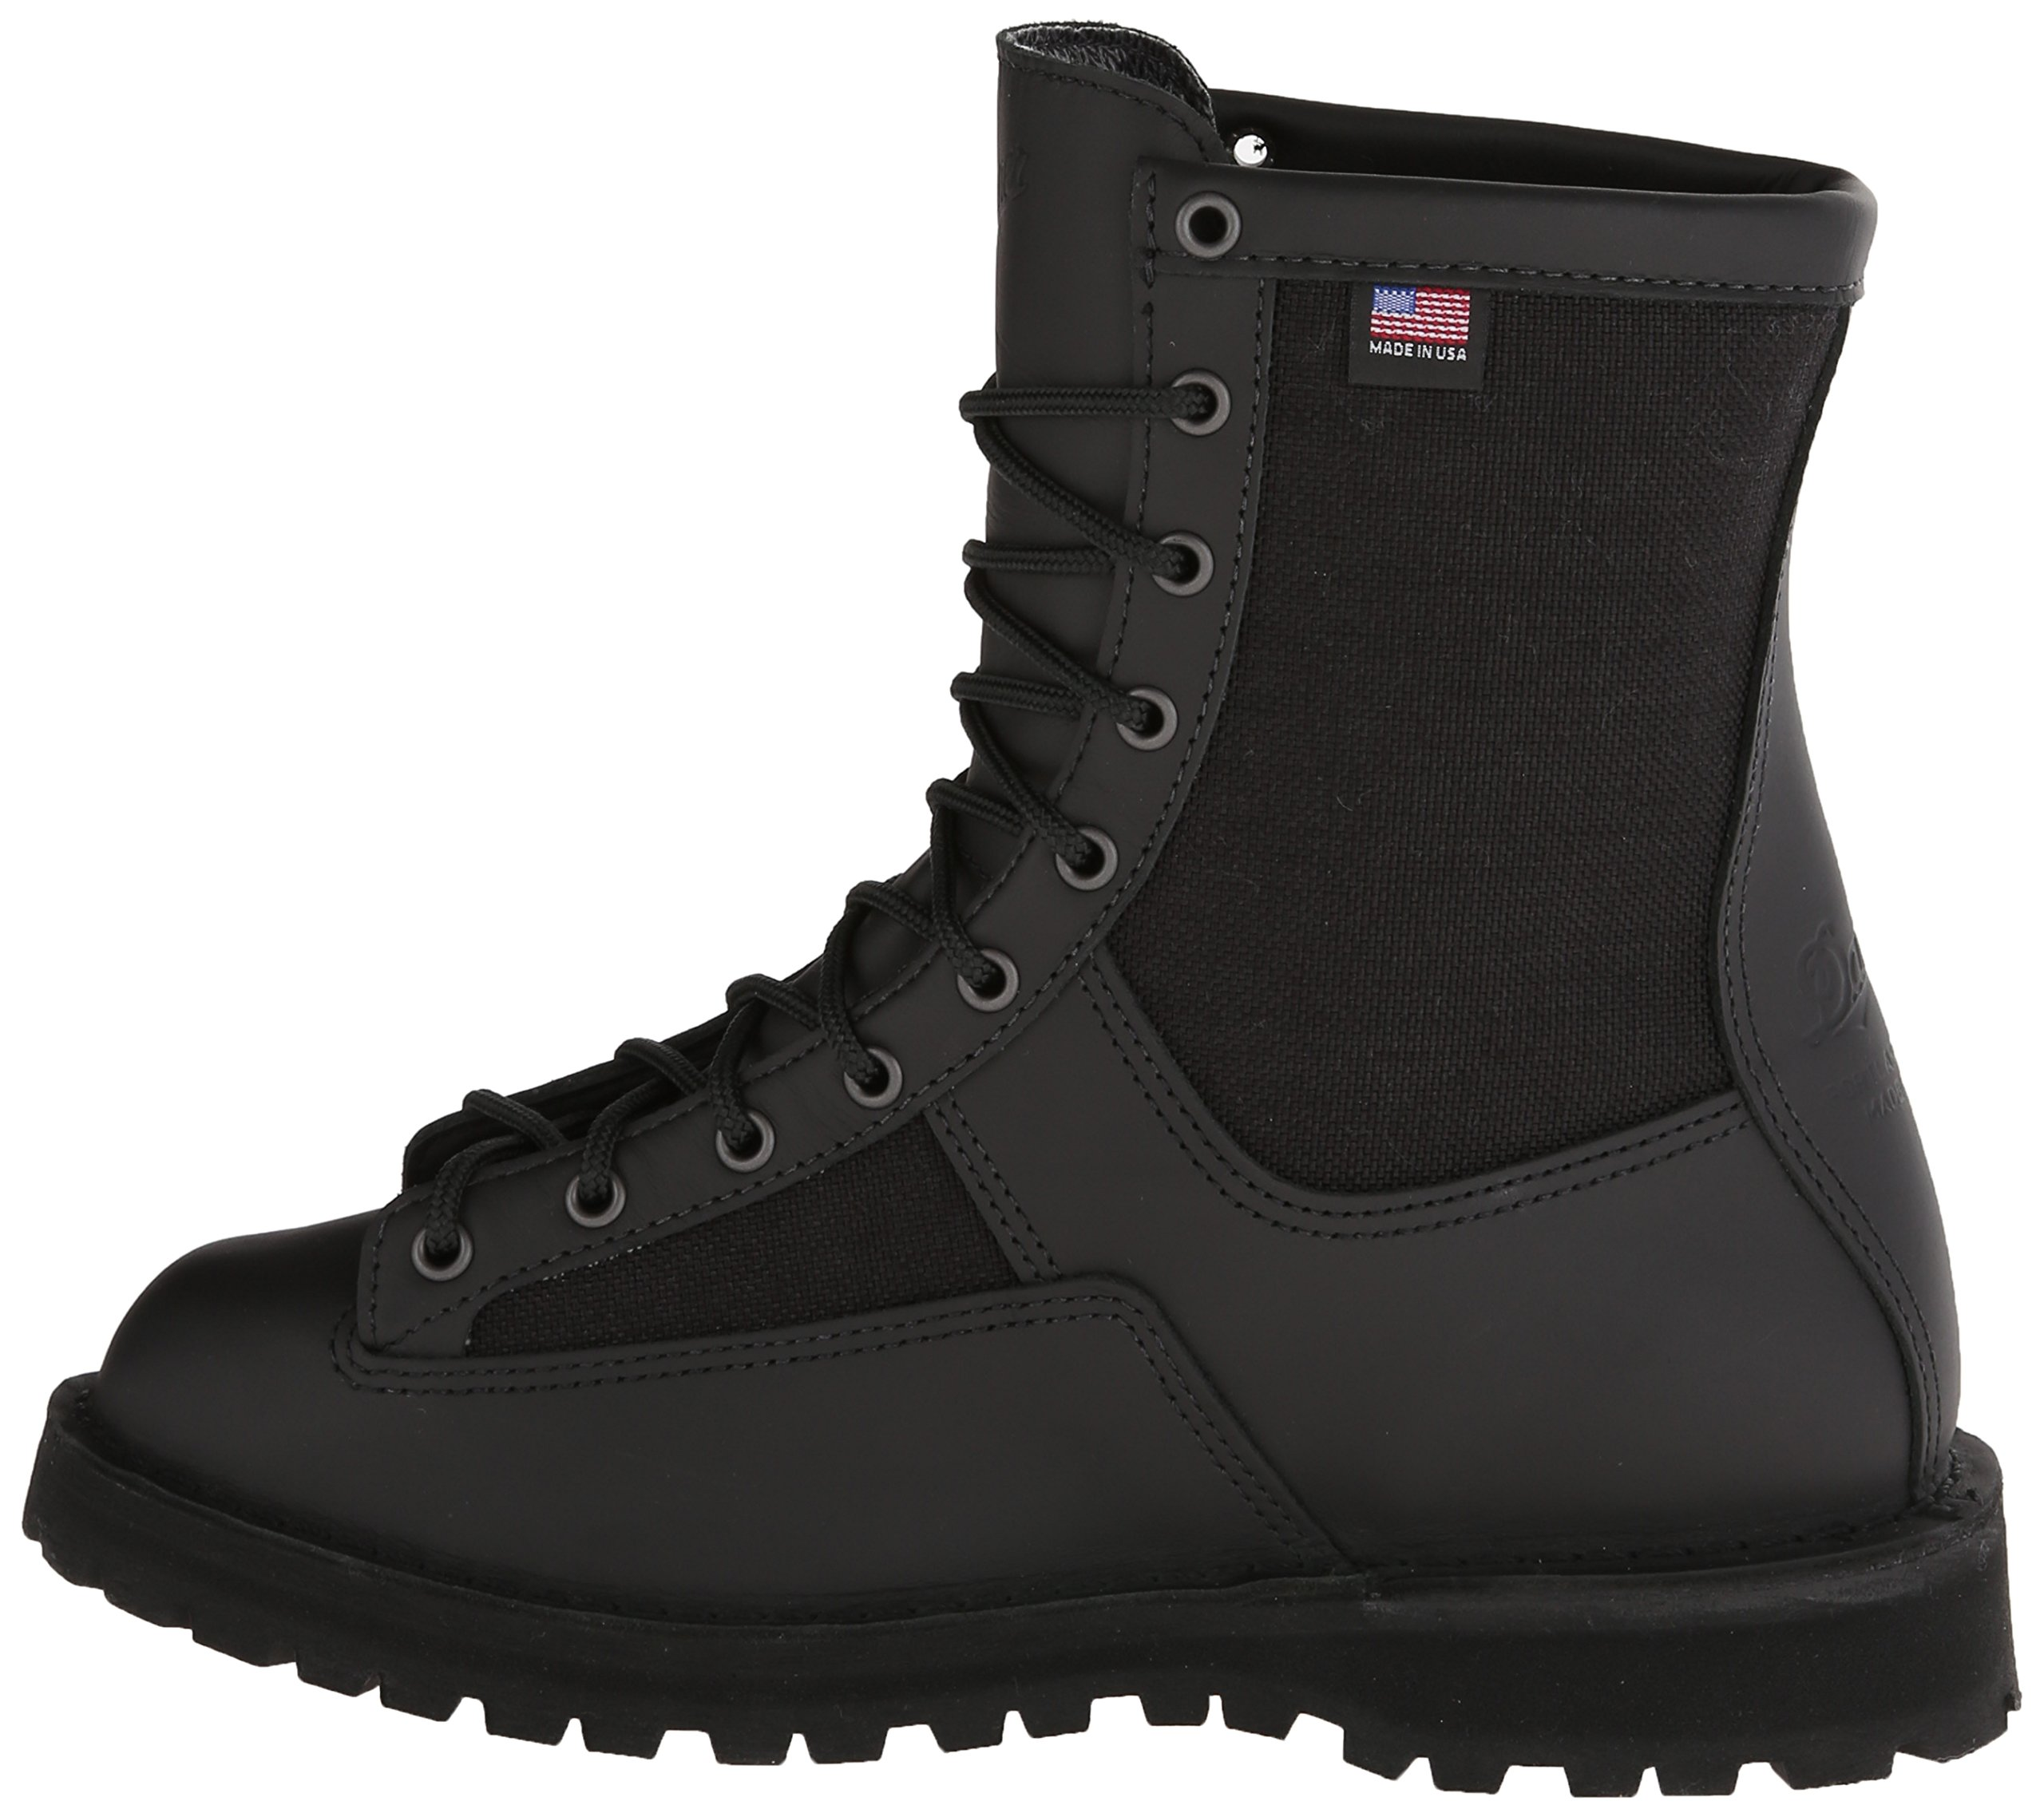 Danner Men's Acadia 8'' 200G Military and Tactical Boot, Black, 13 B US by Danner (Image #5)